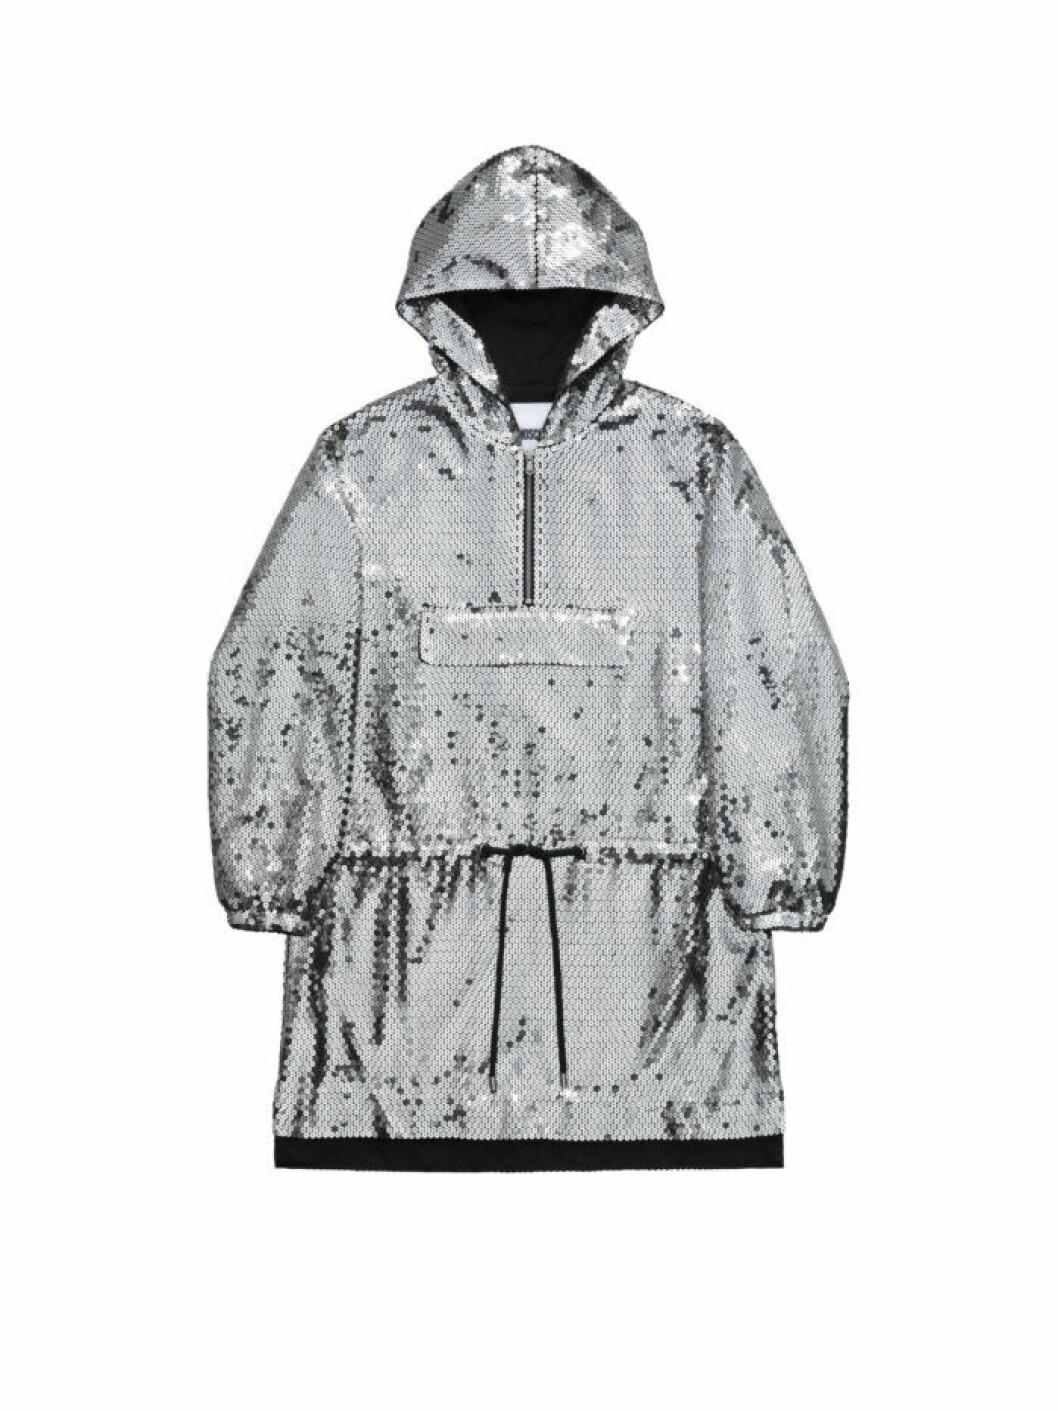 Anorak med silverpaljetter Moschino [tv] H&M